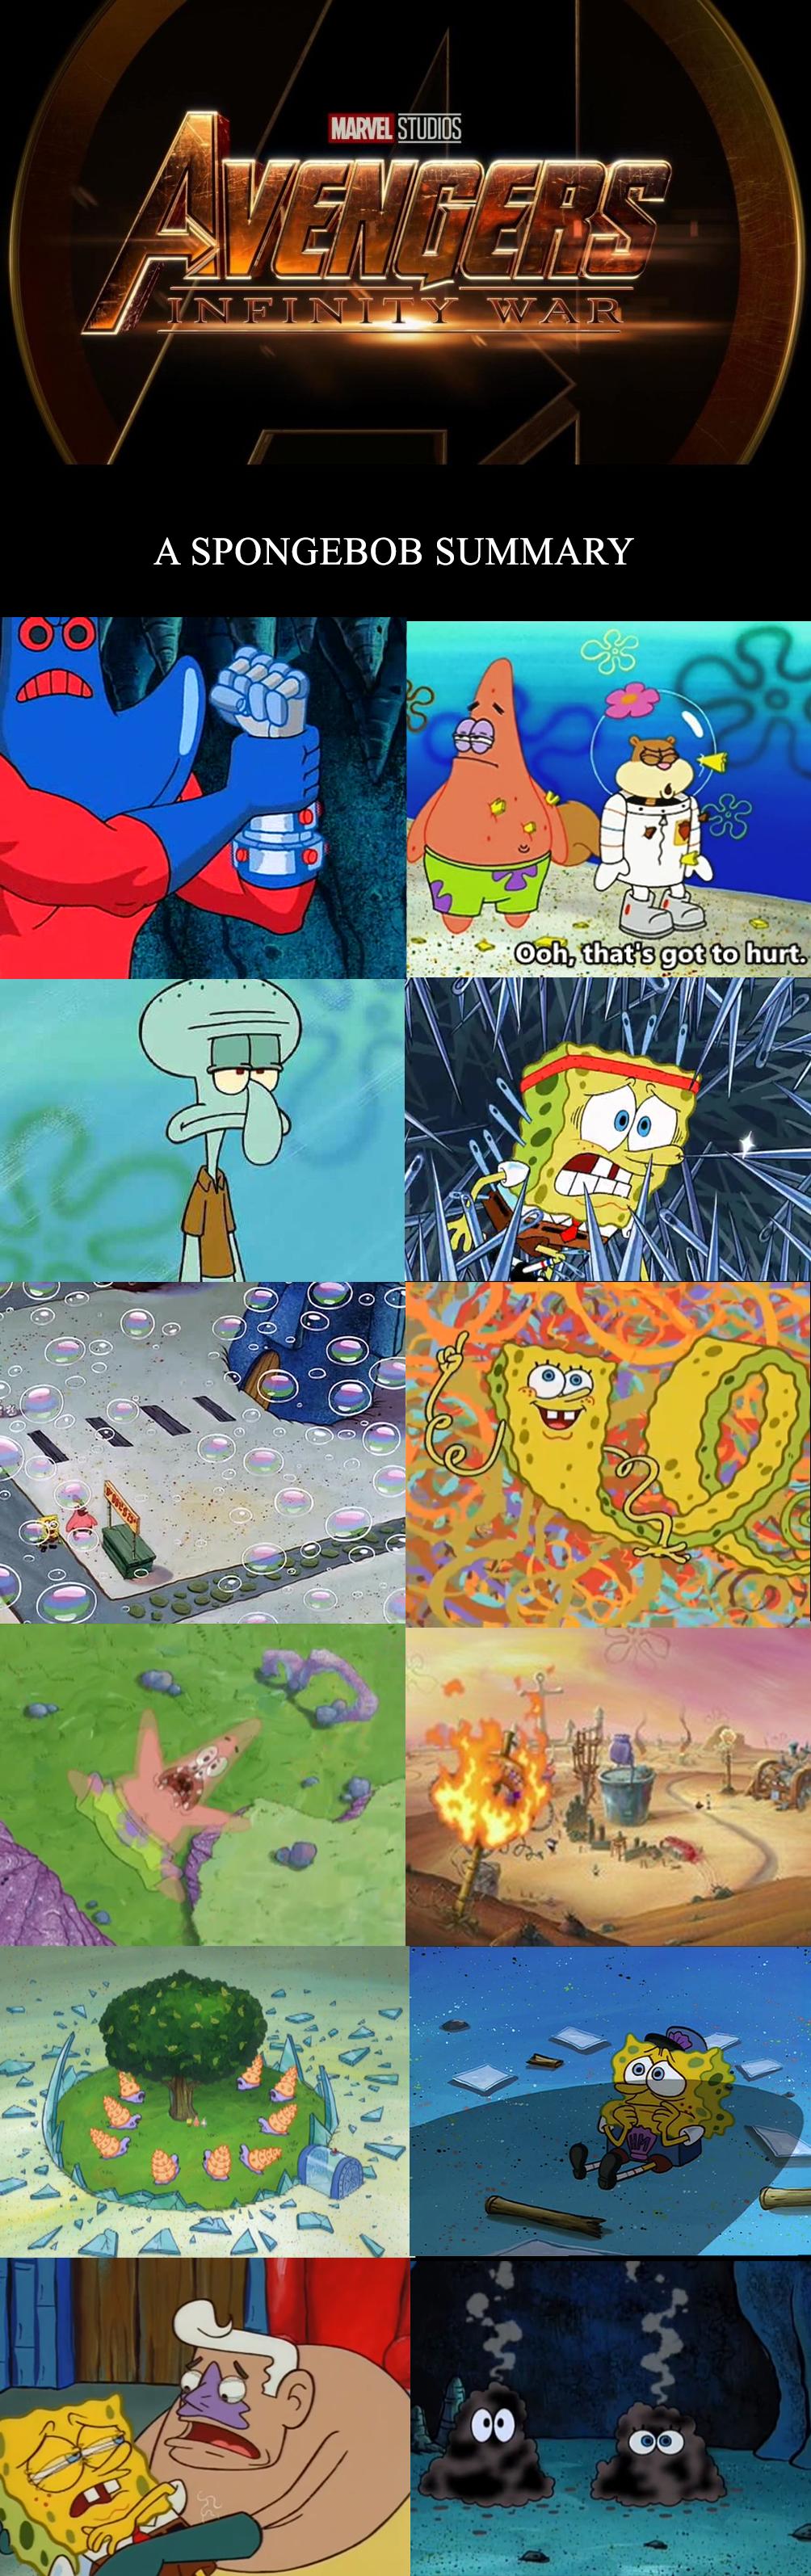 Marvel studios a spongebob summary ooh thatis got to hurt 6